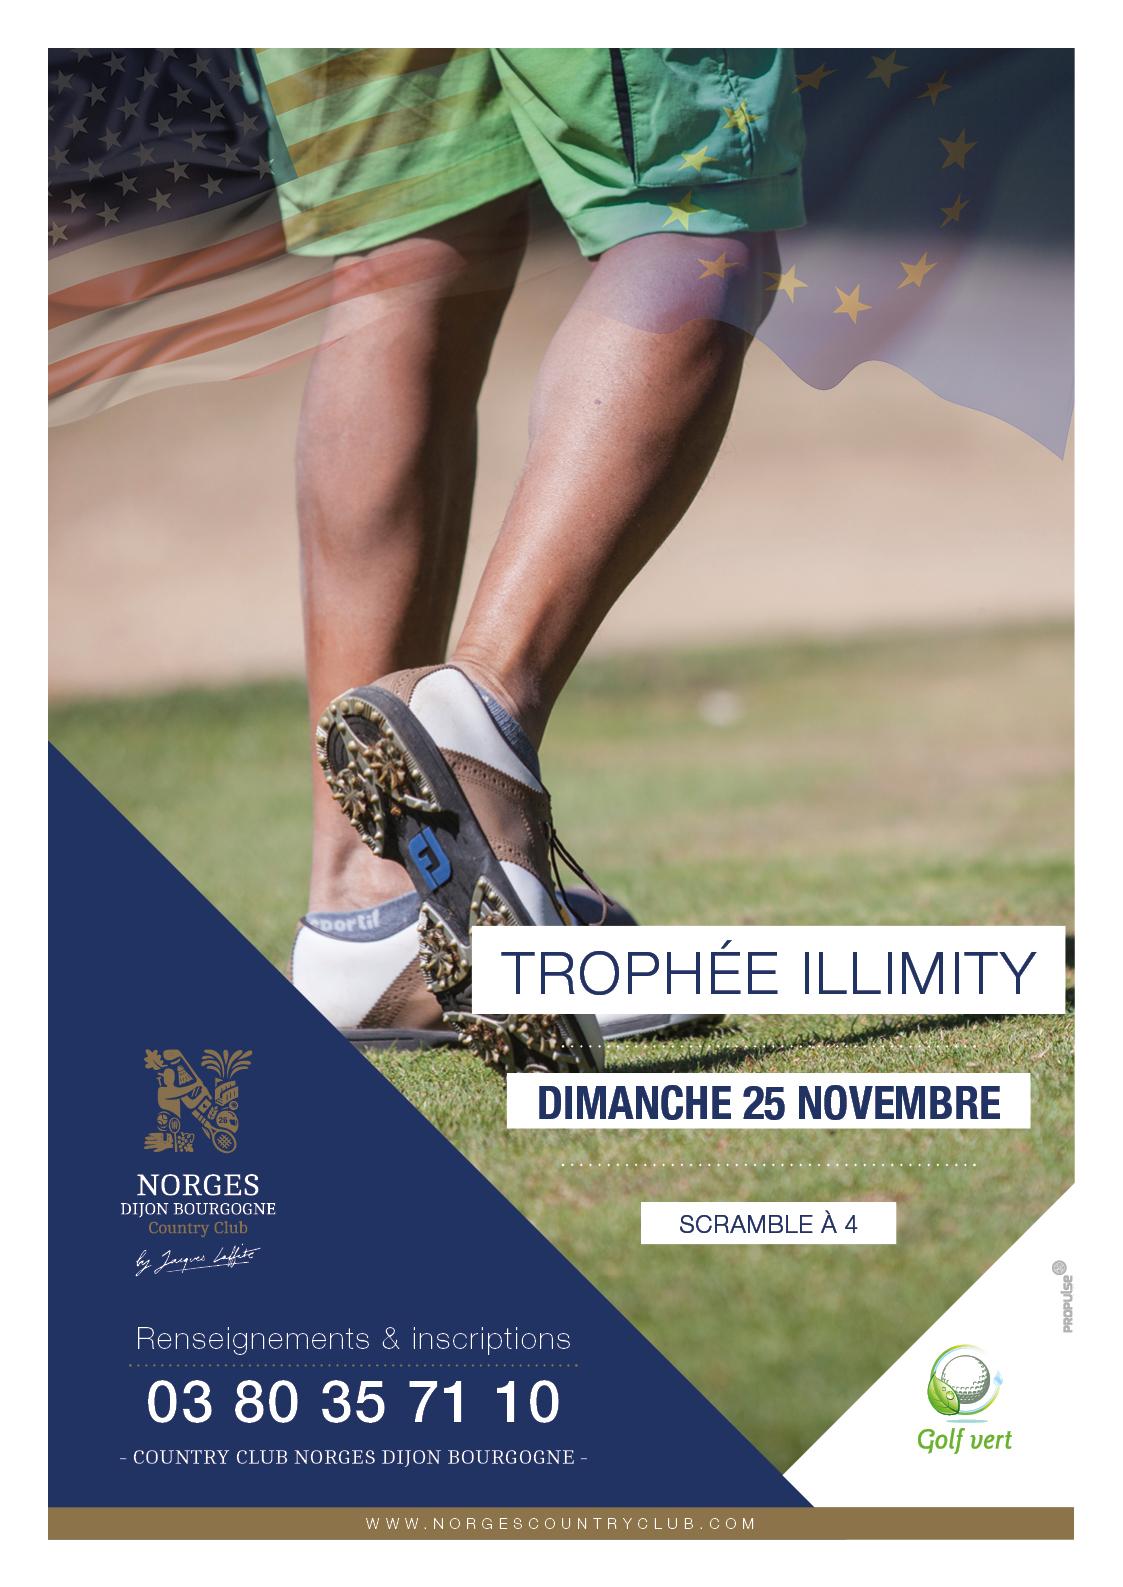 Trophée Illimity